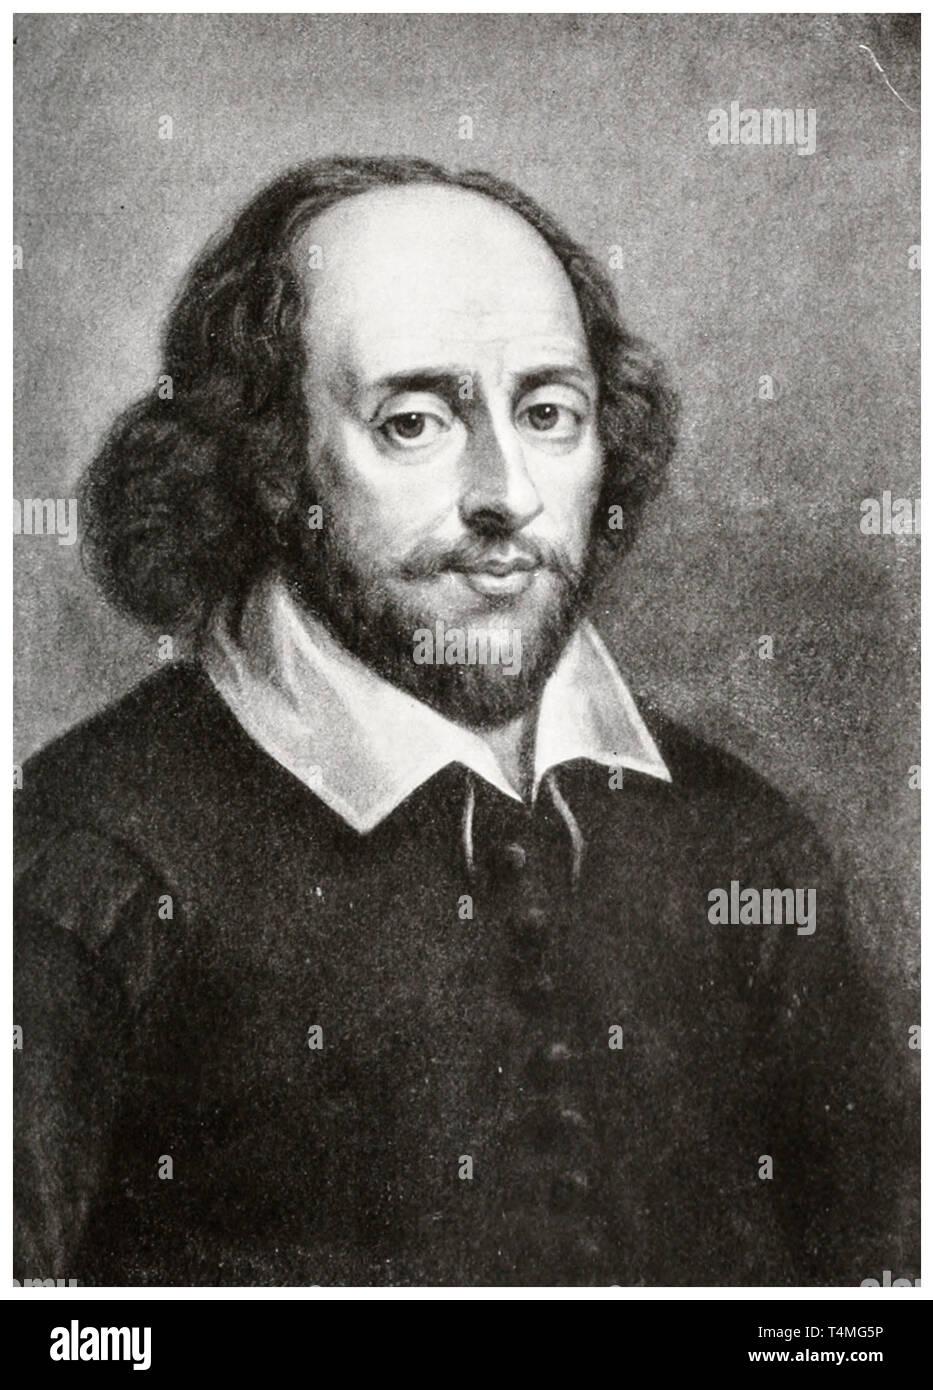 William Shakespeare (1564-1616), portrait etching, 1908 Stock Photo